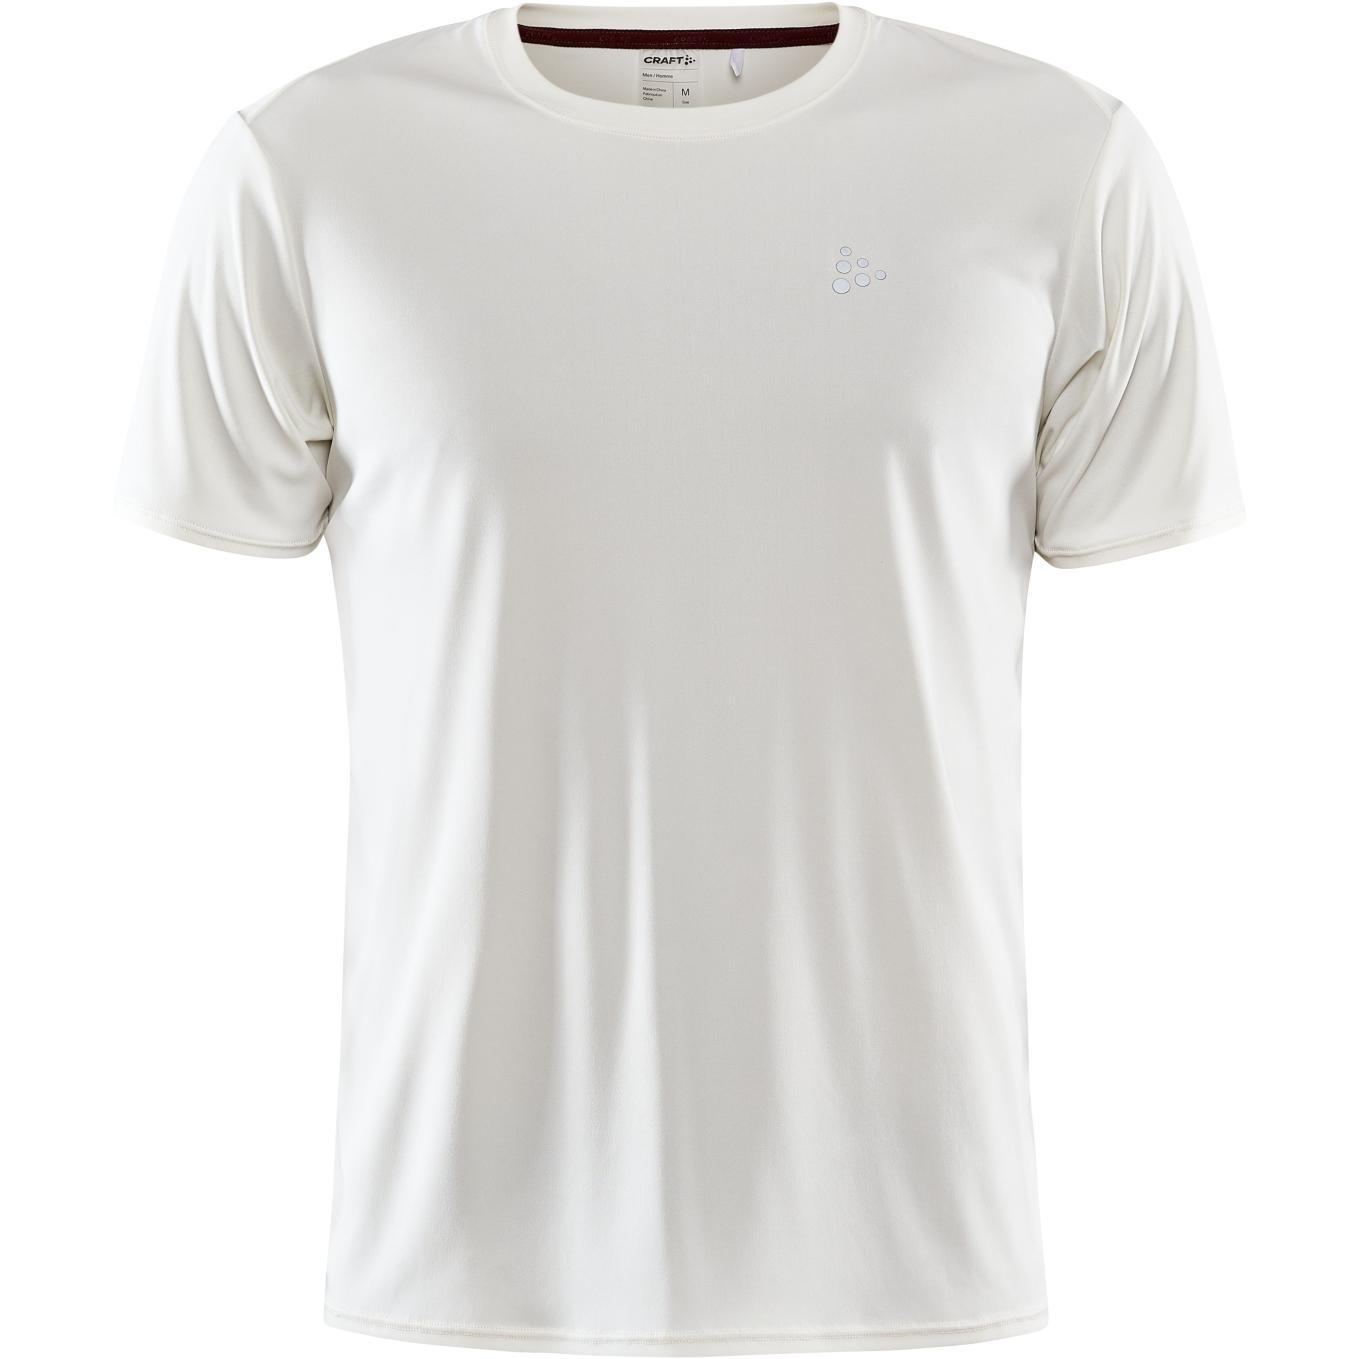 CRAFT ADV Charge Men's T-Shirt 1909608 - 904000 Whisper